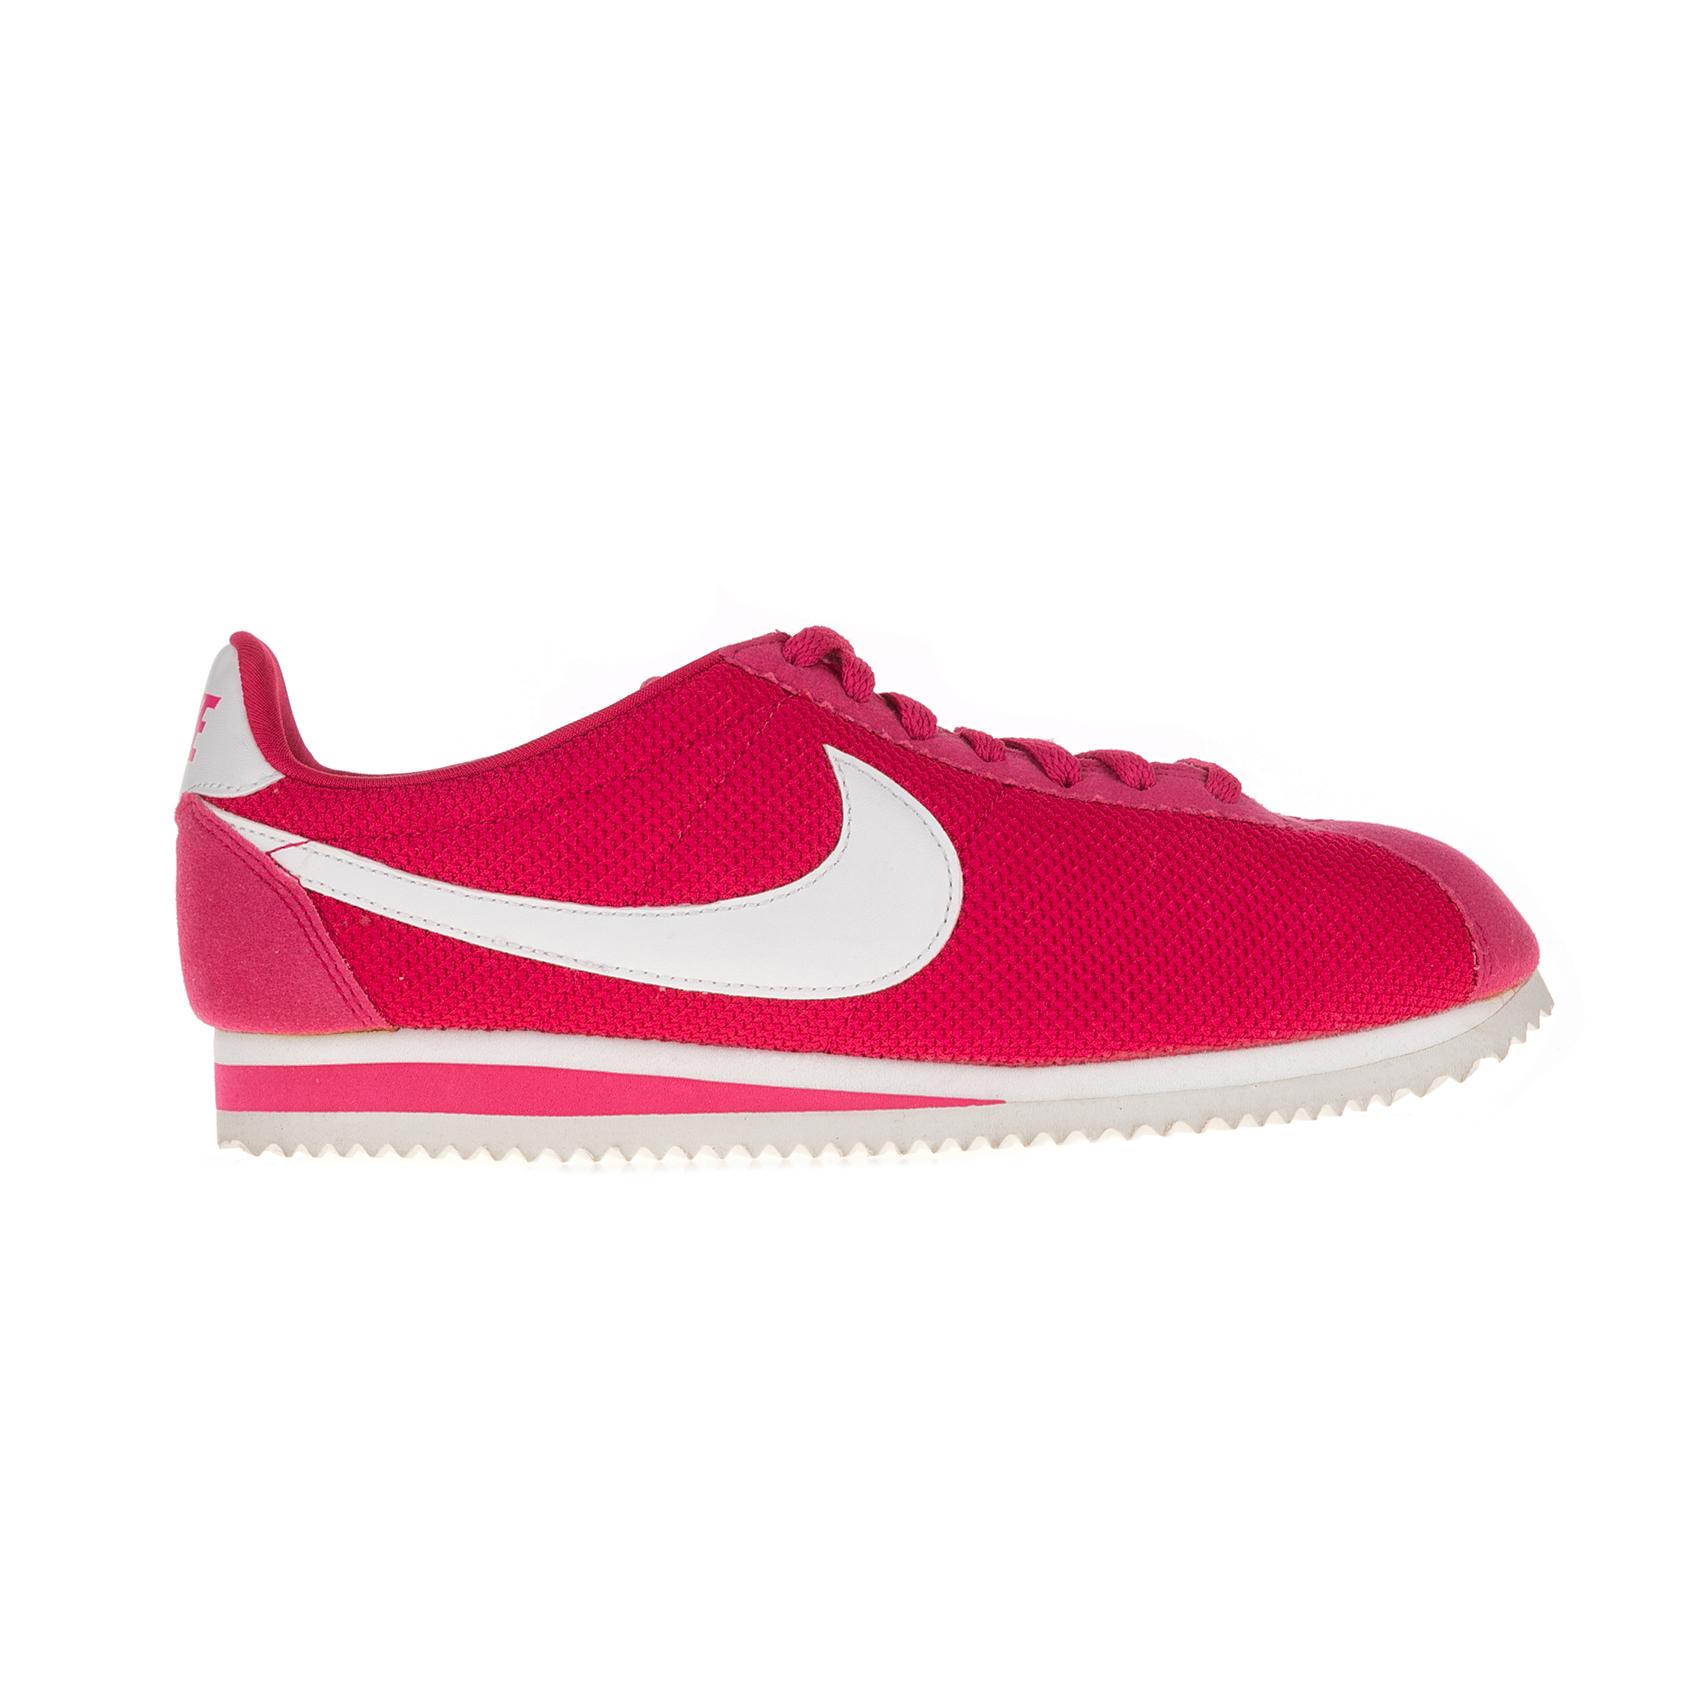 NIKE – Γυναικεία παπούτσια NIke CLASSIC CORTEZ NYLON φούξια